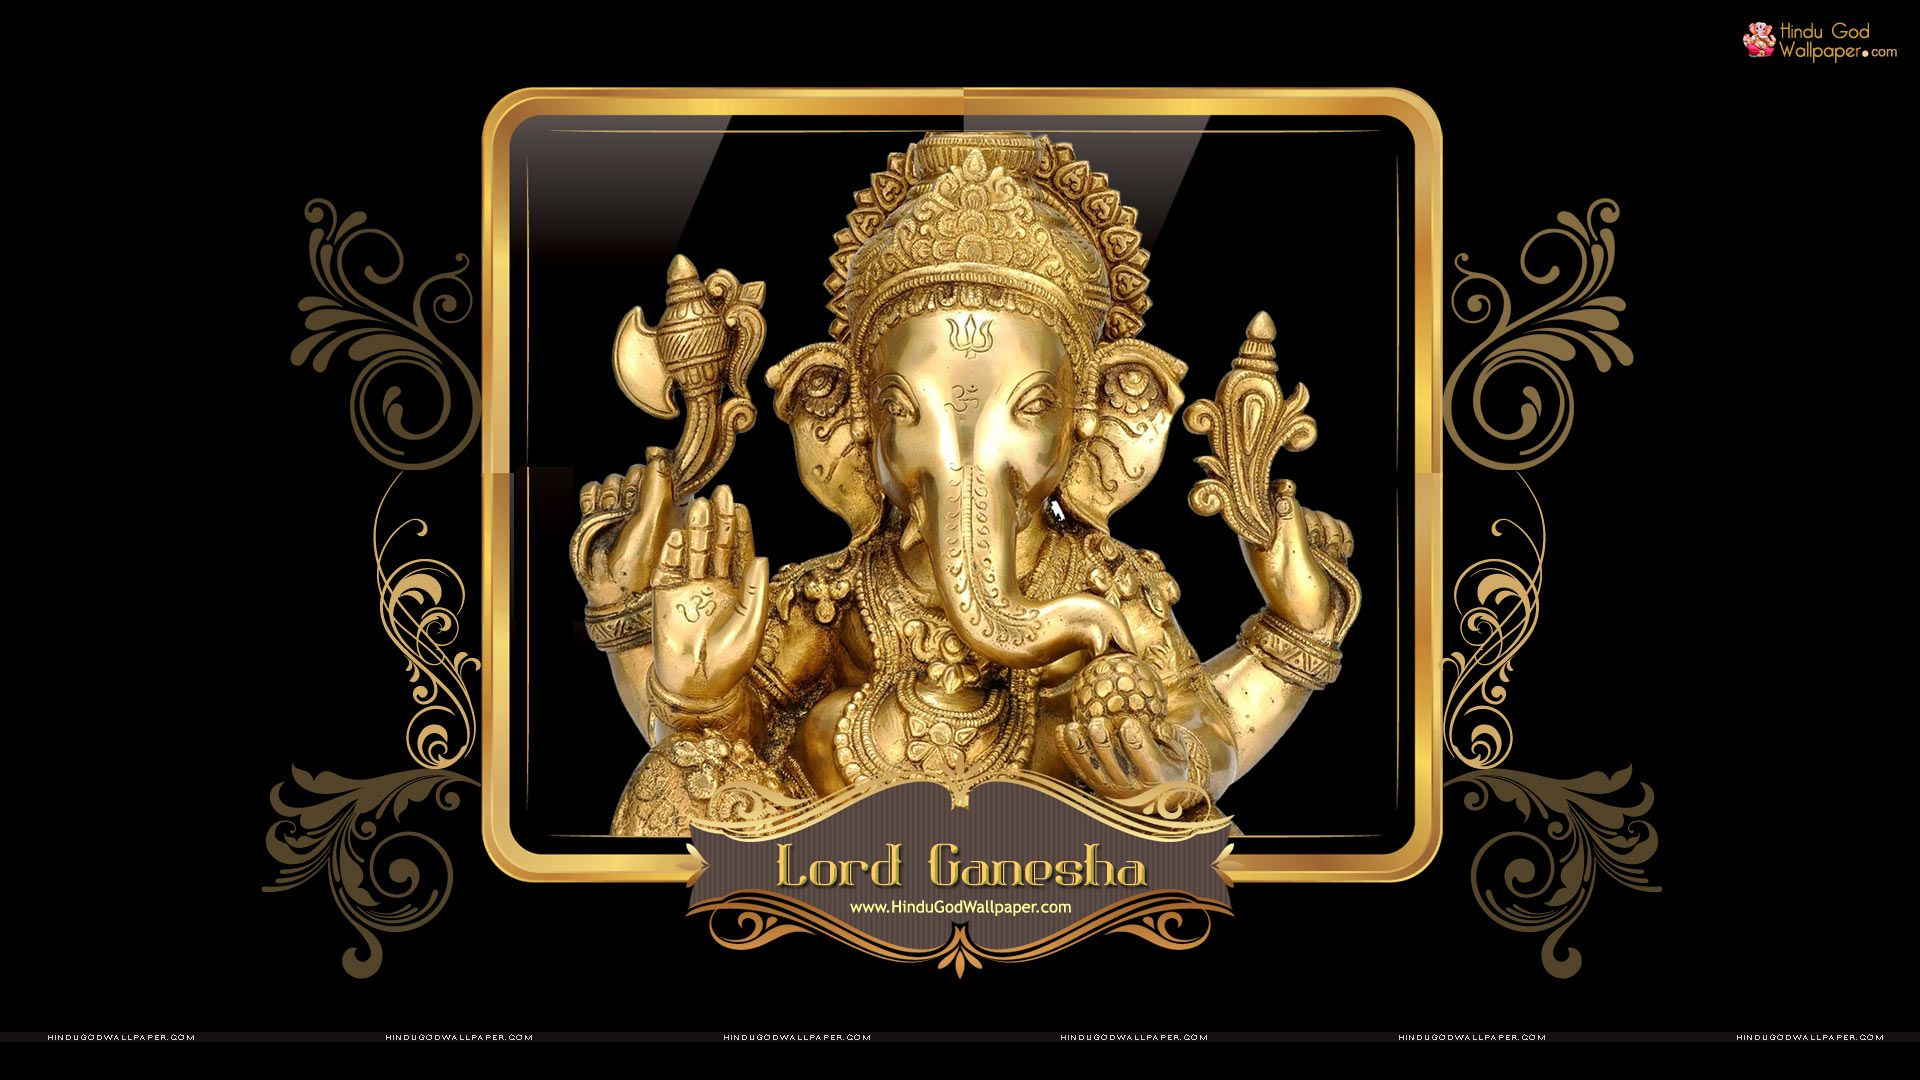 Pen Ganesh Murtidownload Hd: Lord Ganesha Wallpaper 1080p HD High Resolution Download